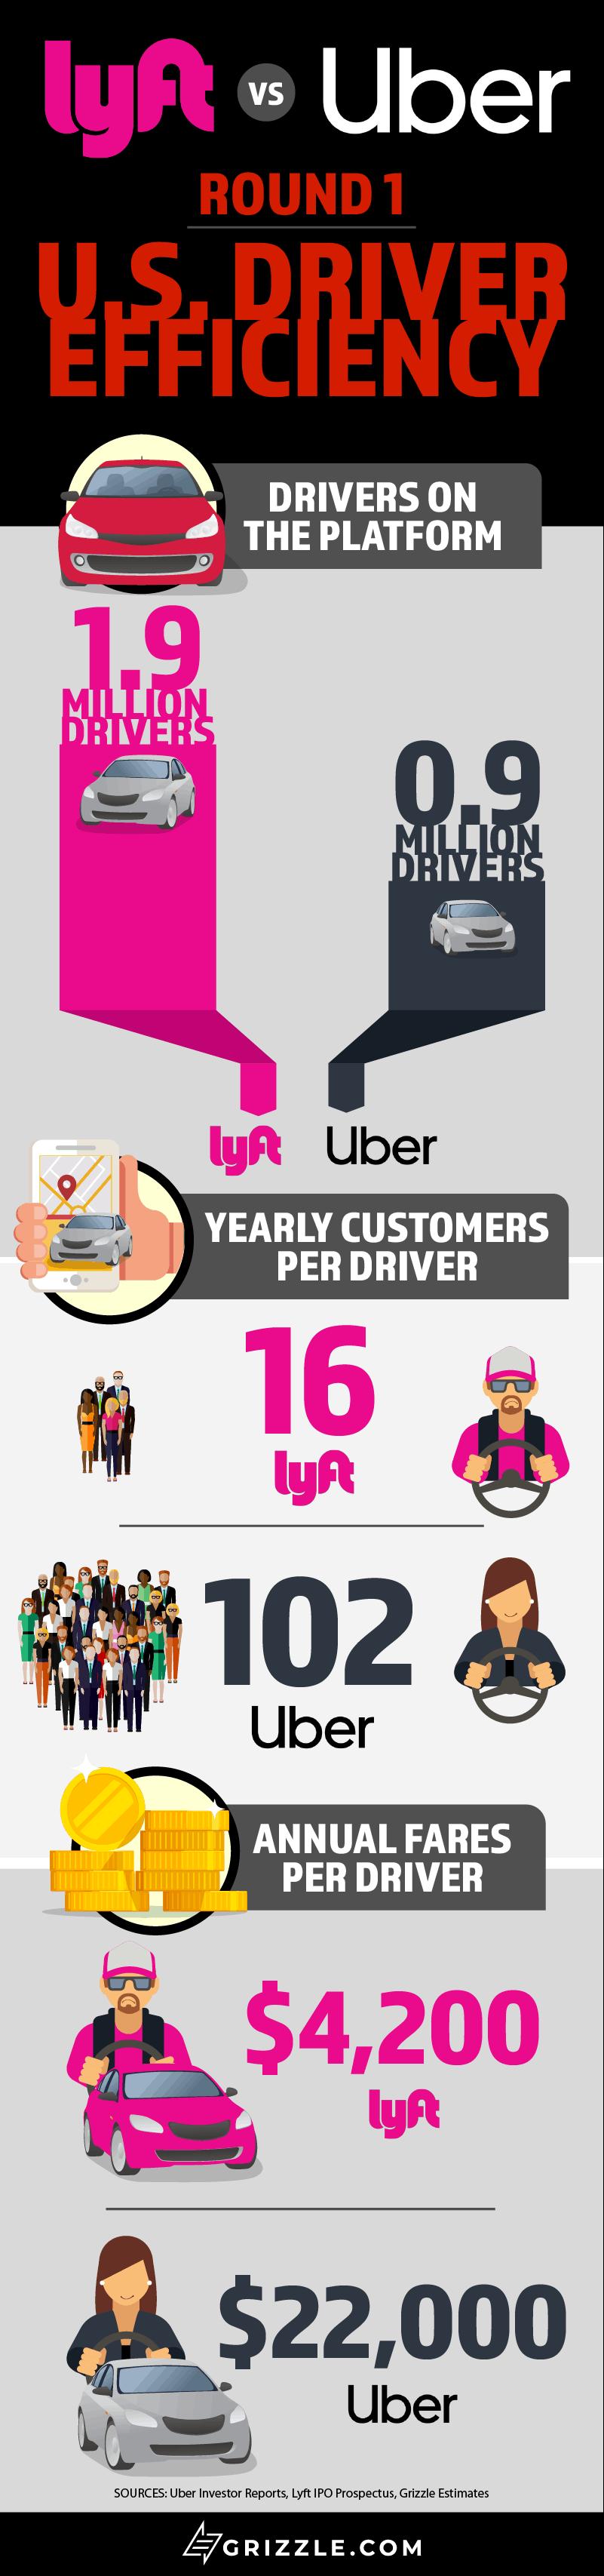 Lyft vs Uber U.S. Driver Effeciency